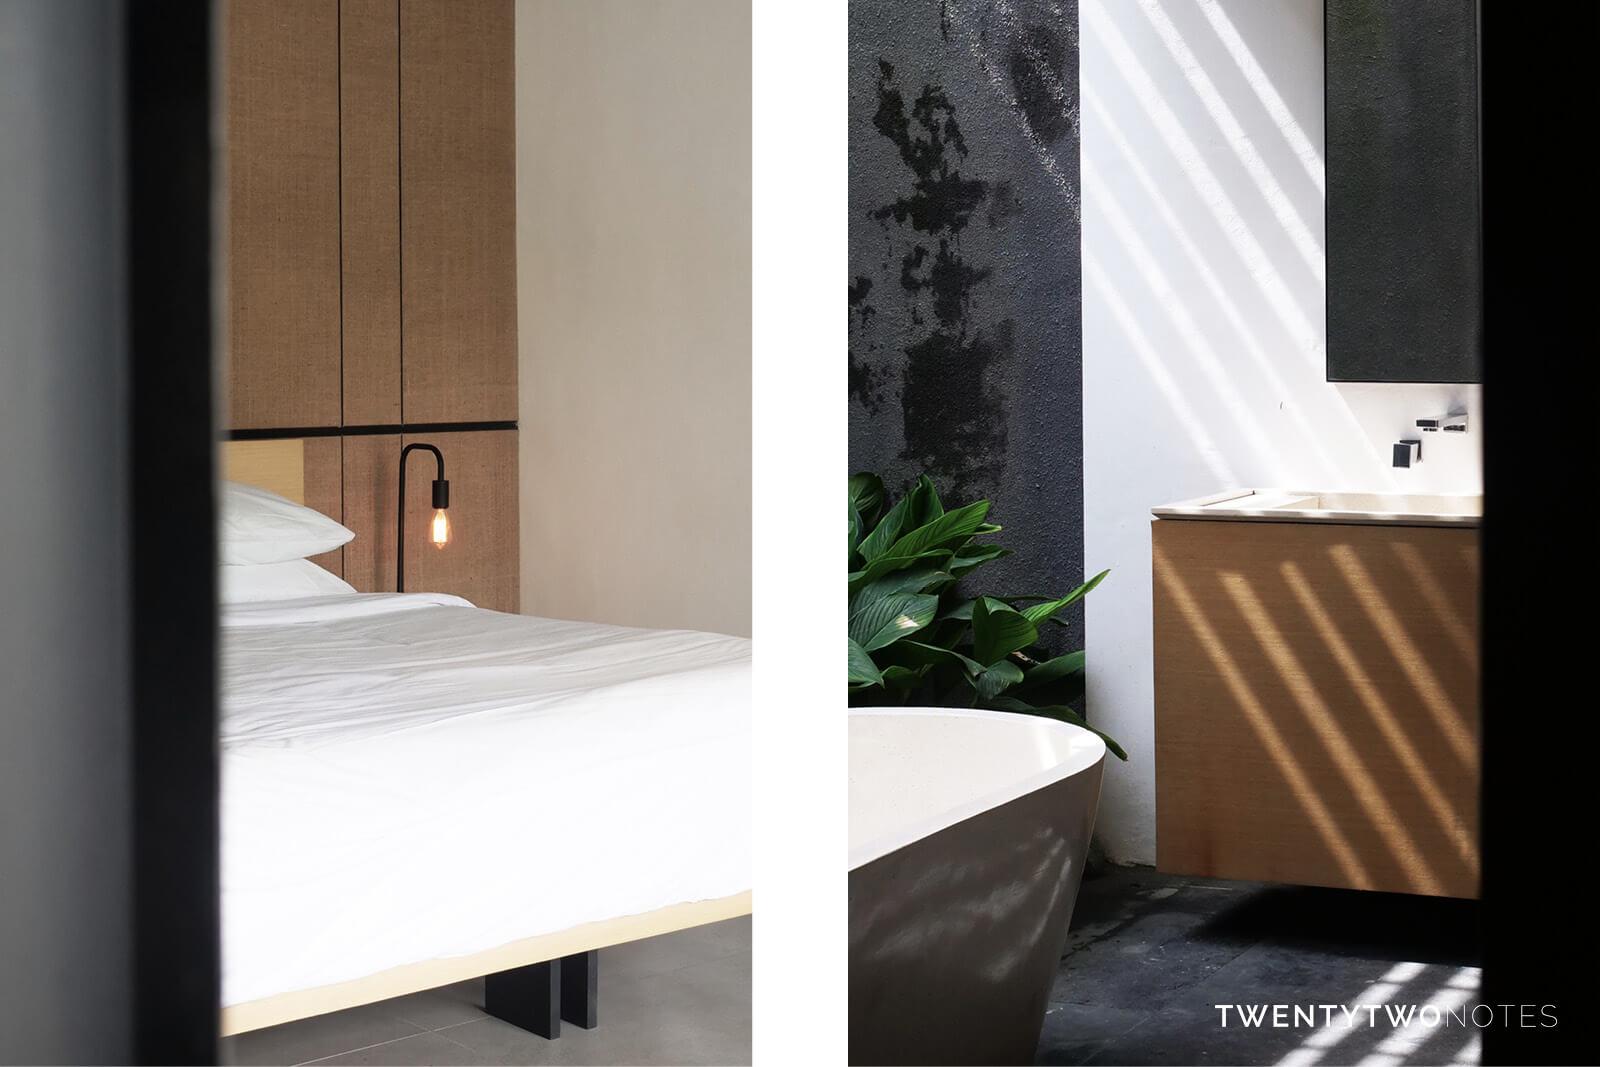 Twentytwonotes boutique stijl privé villa voor minimalistisch